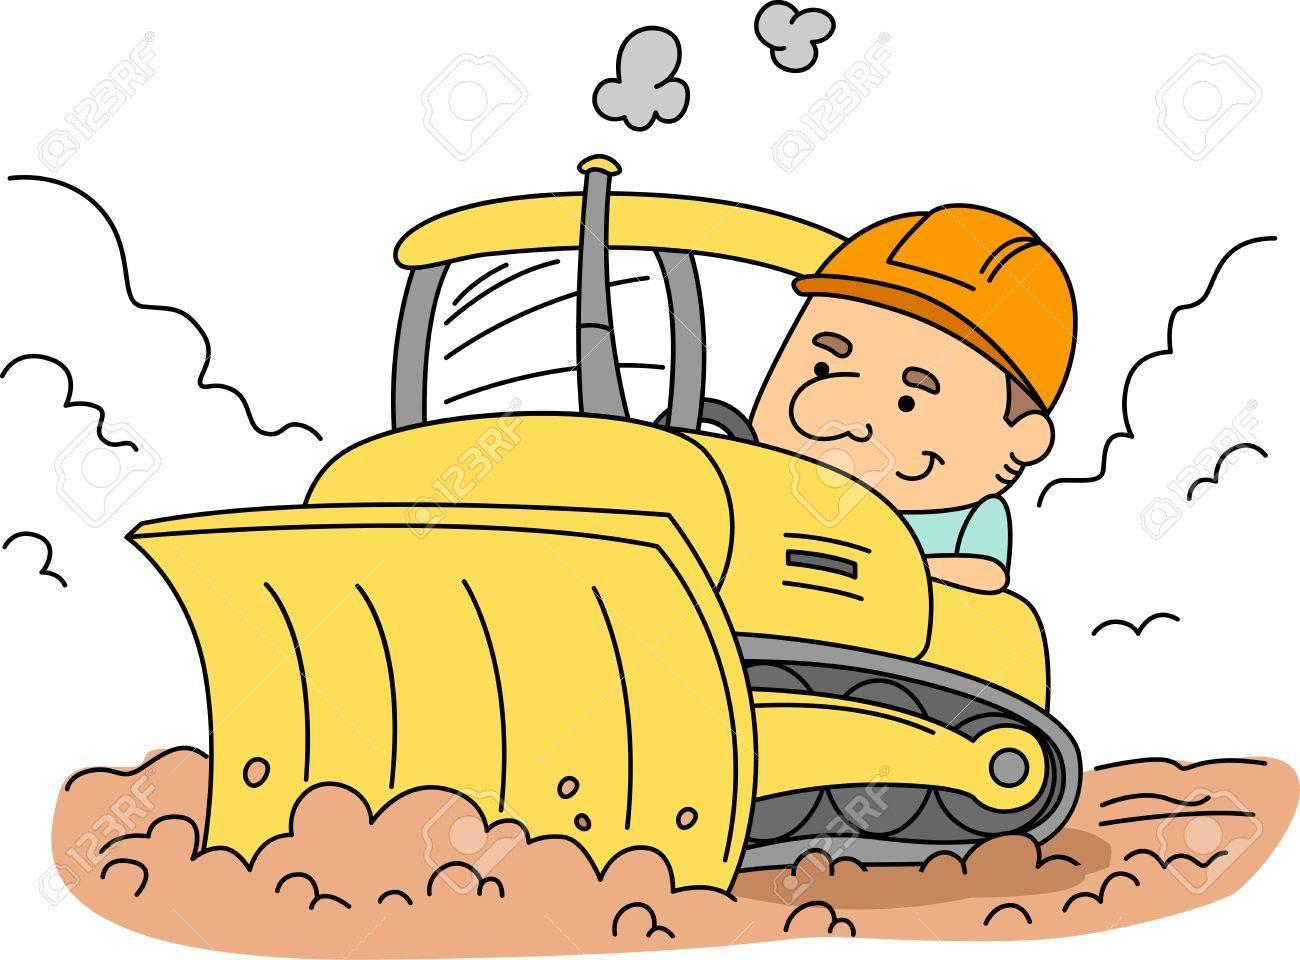 Illustration of a Man Operating a Bulldozer Stock Illustration - 9456872